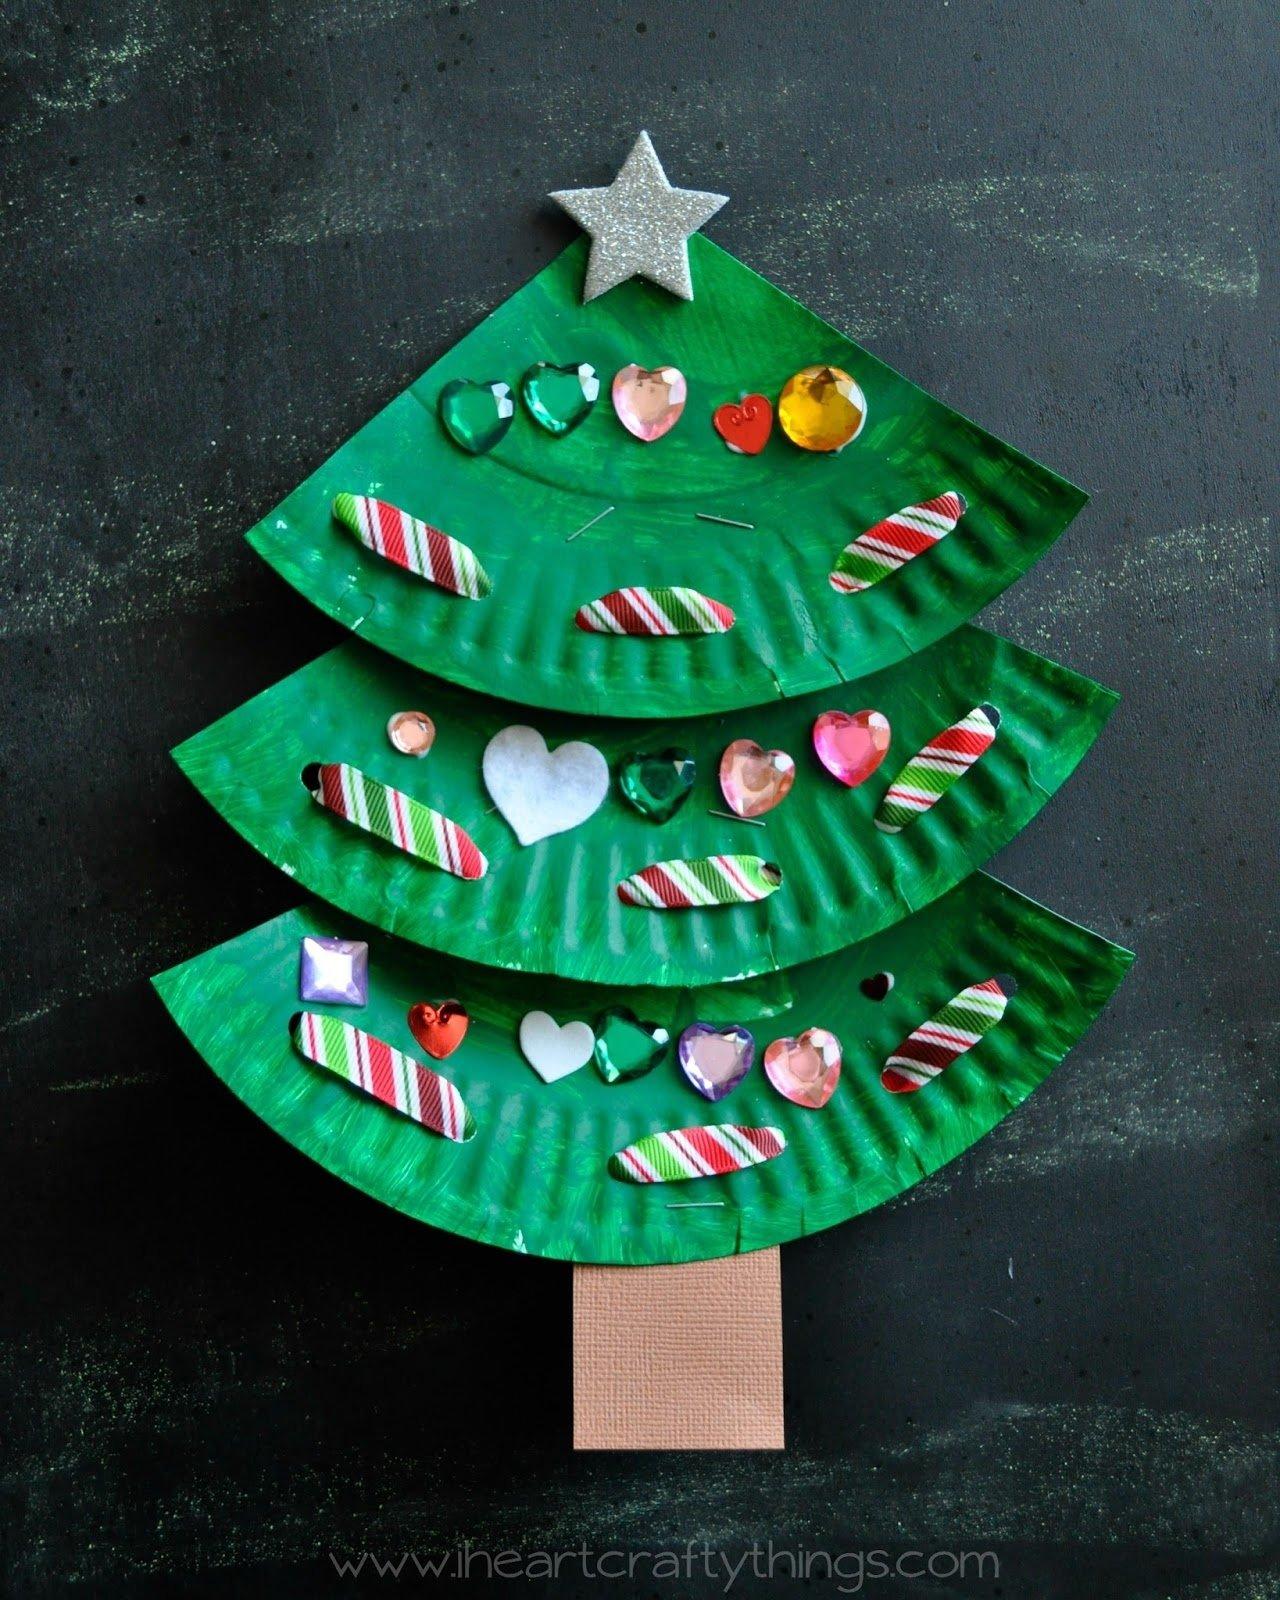 10 Stylish Christmas Craft Ideas For Kids To Make christmas tree crafts for kids to make ye craft ideas 2021